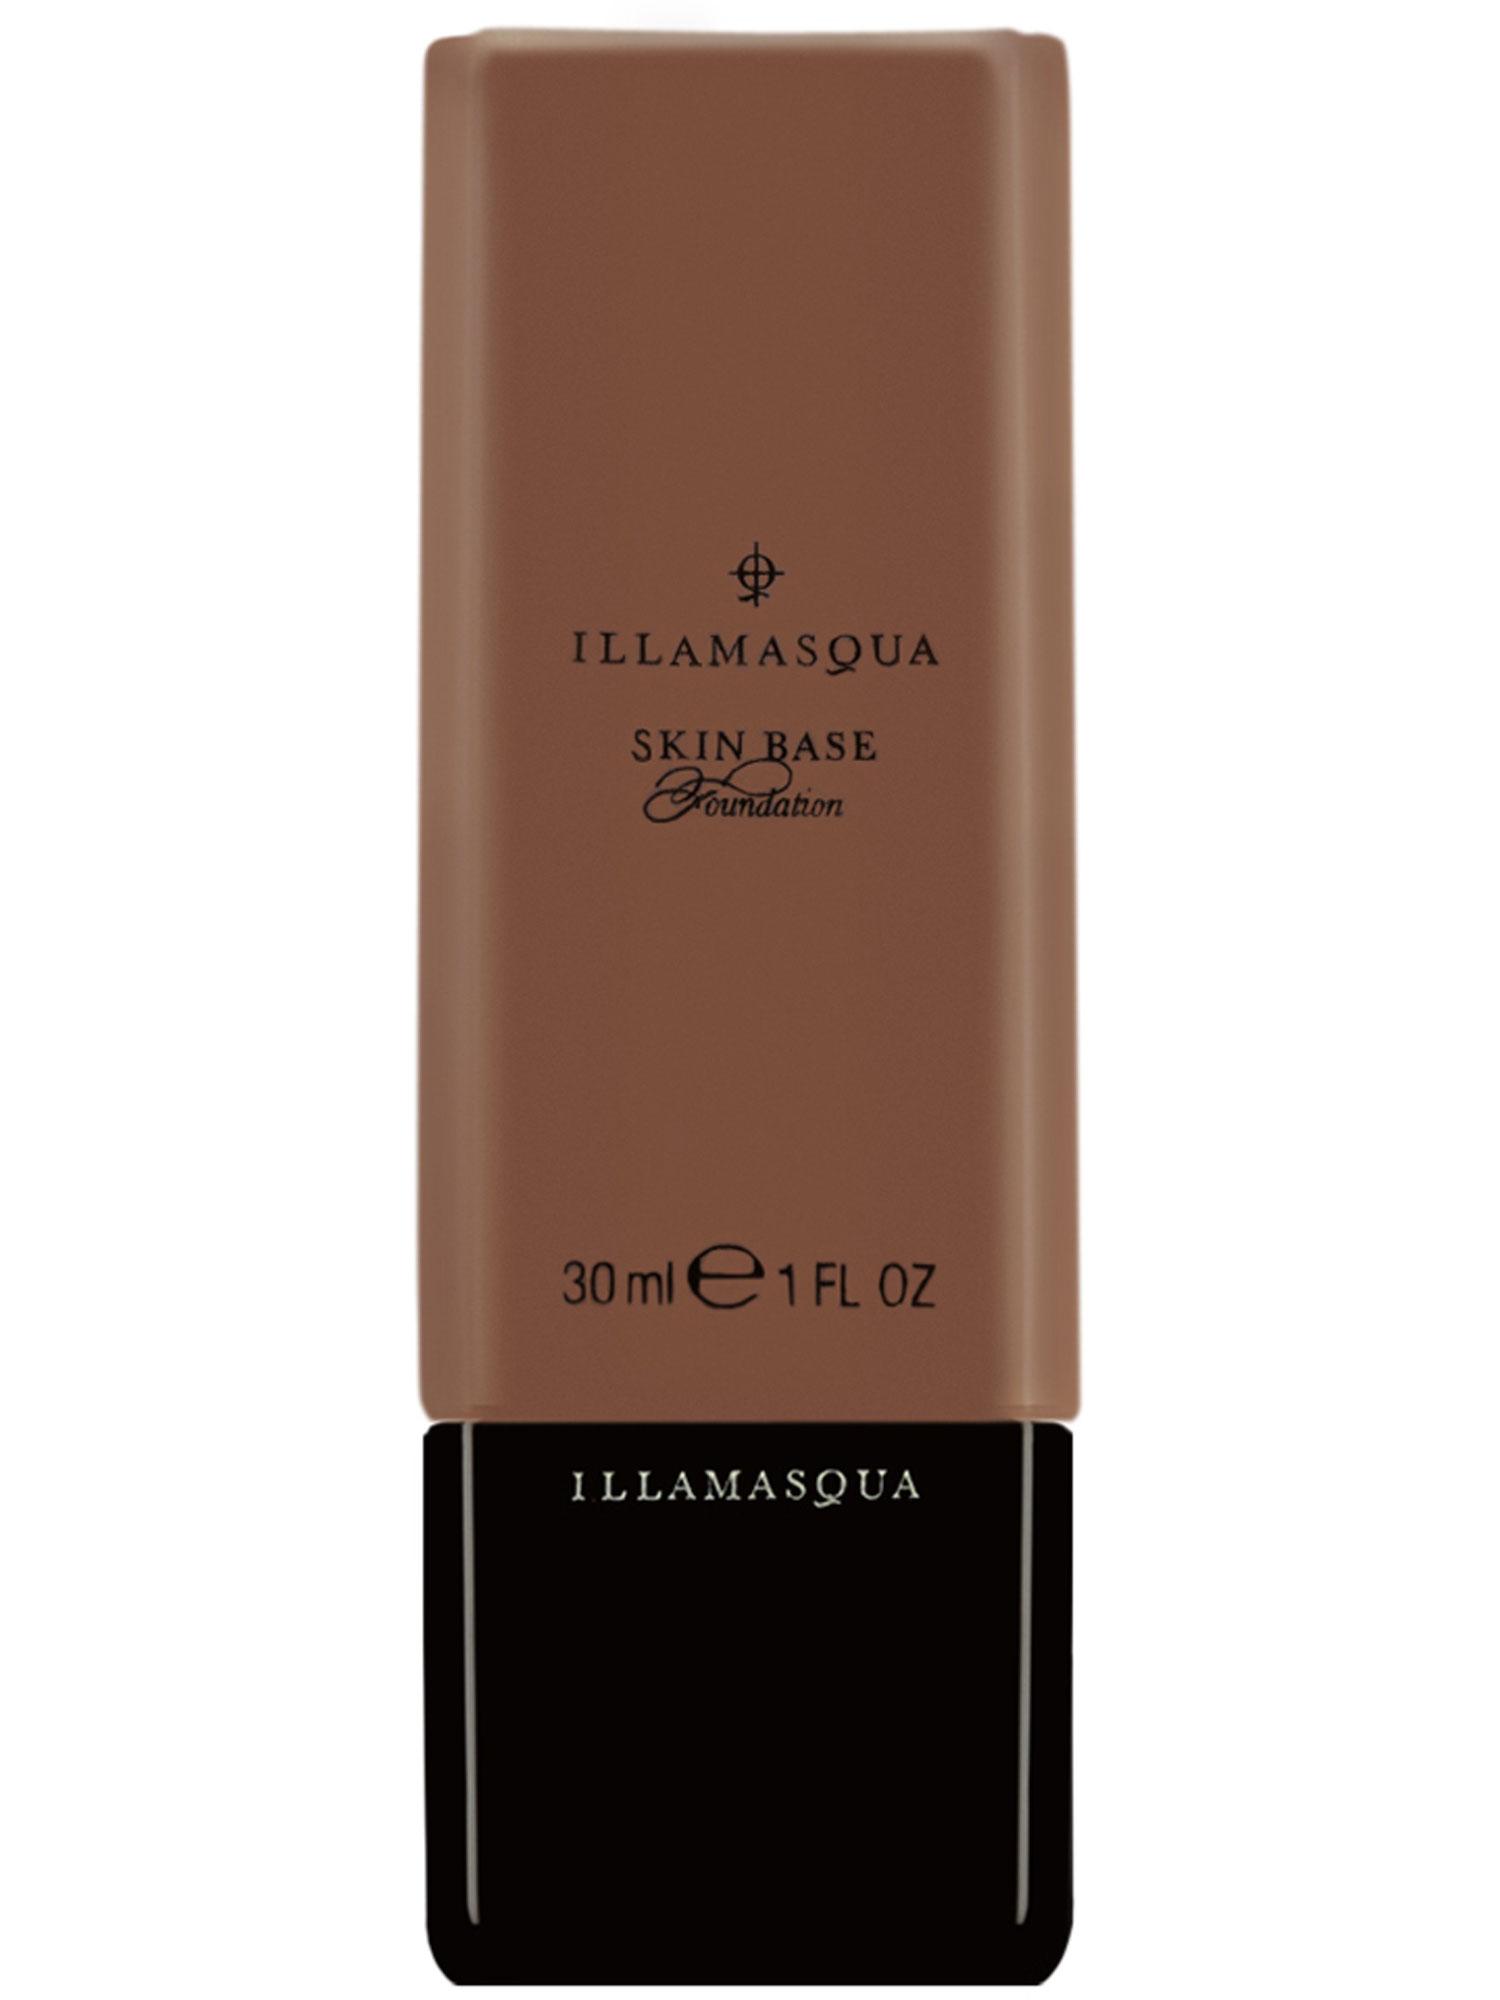 ILLAMASQUA-Skin-Base-Foundation-30-ml-1-FL-OZ-43-NEW thumbnail 21